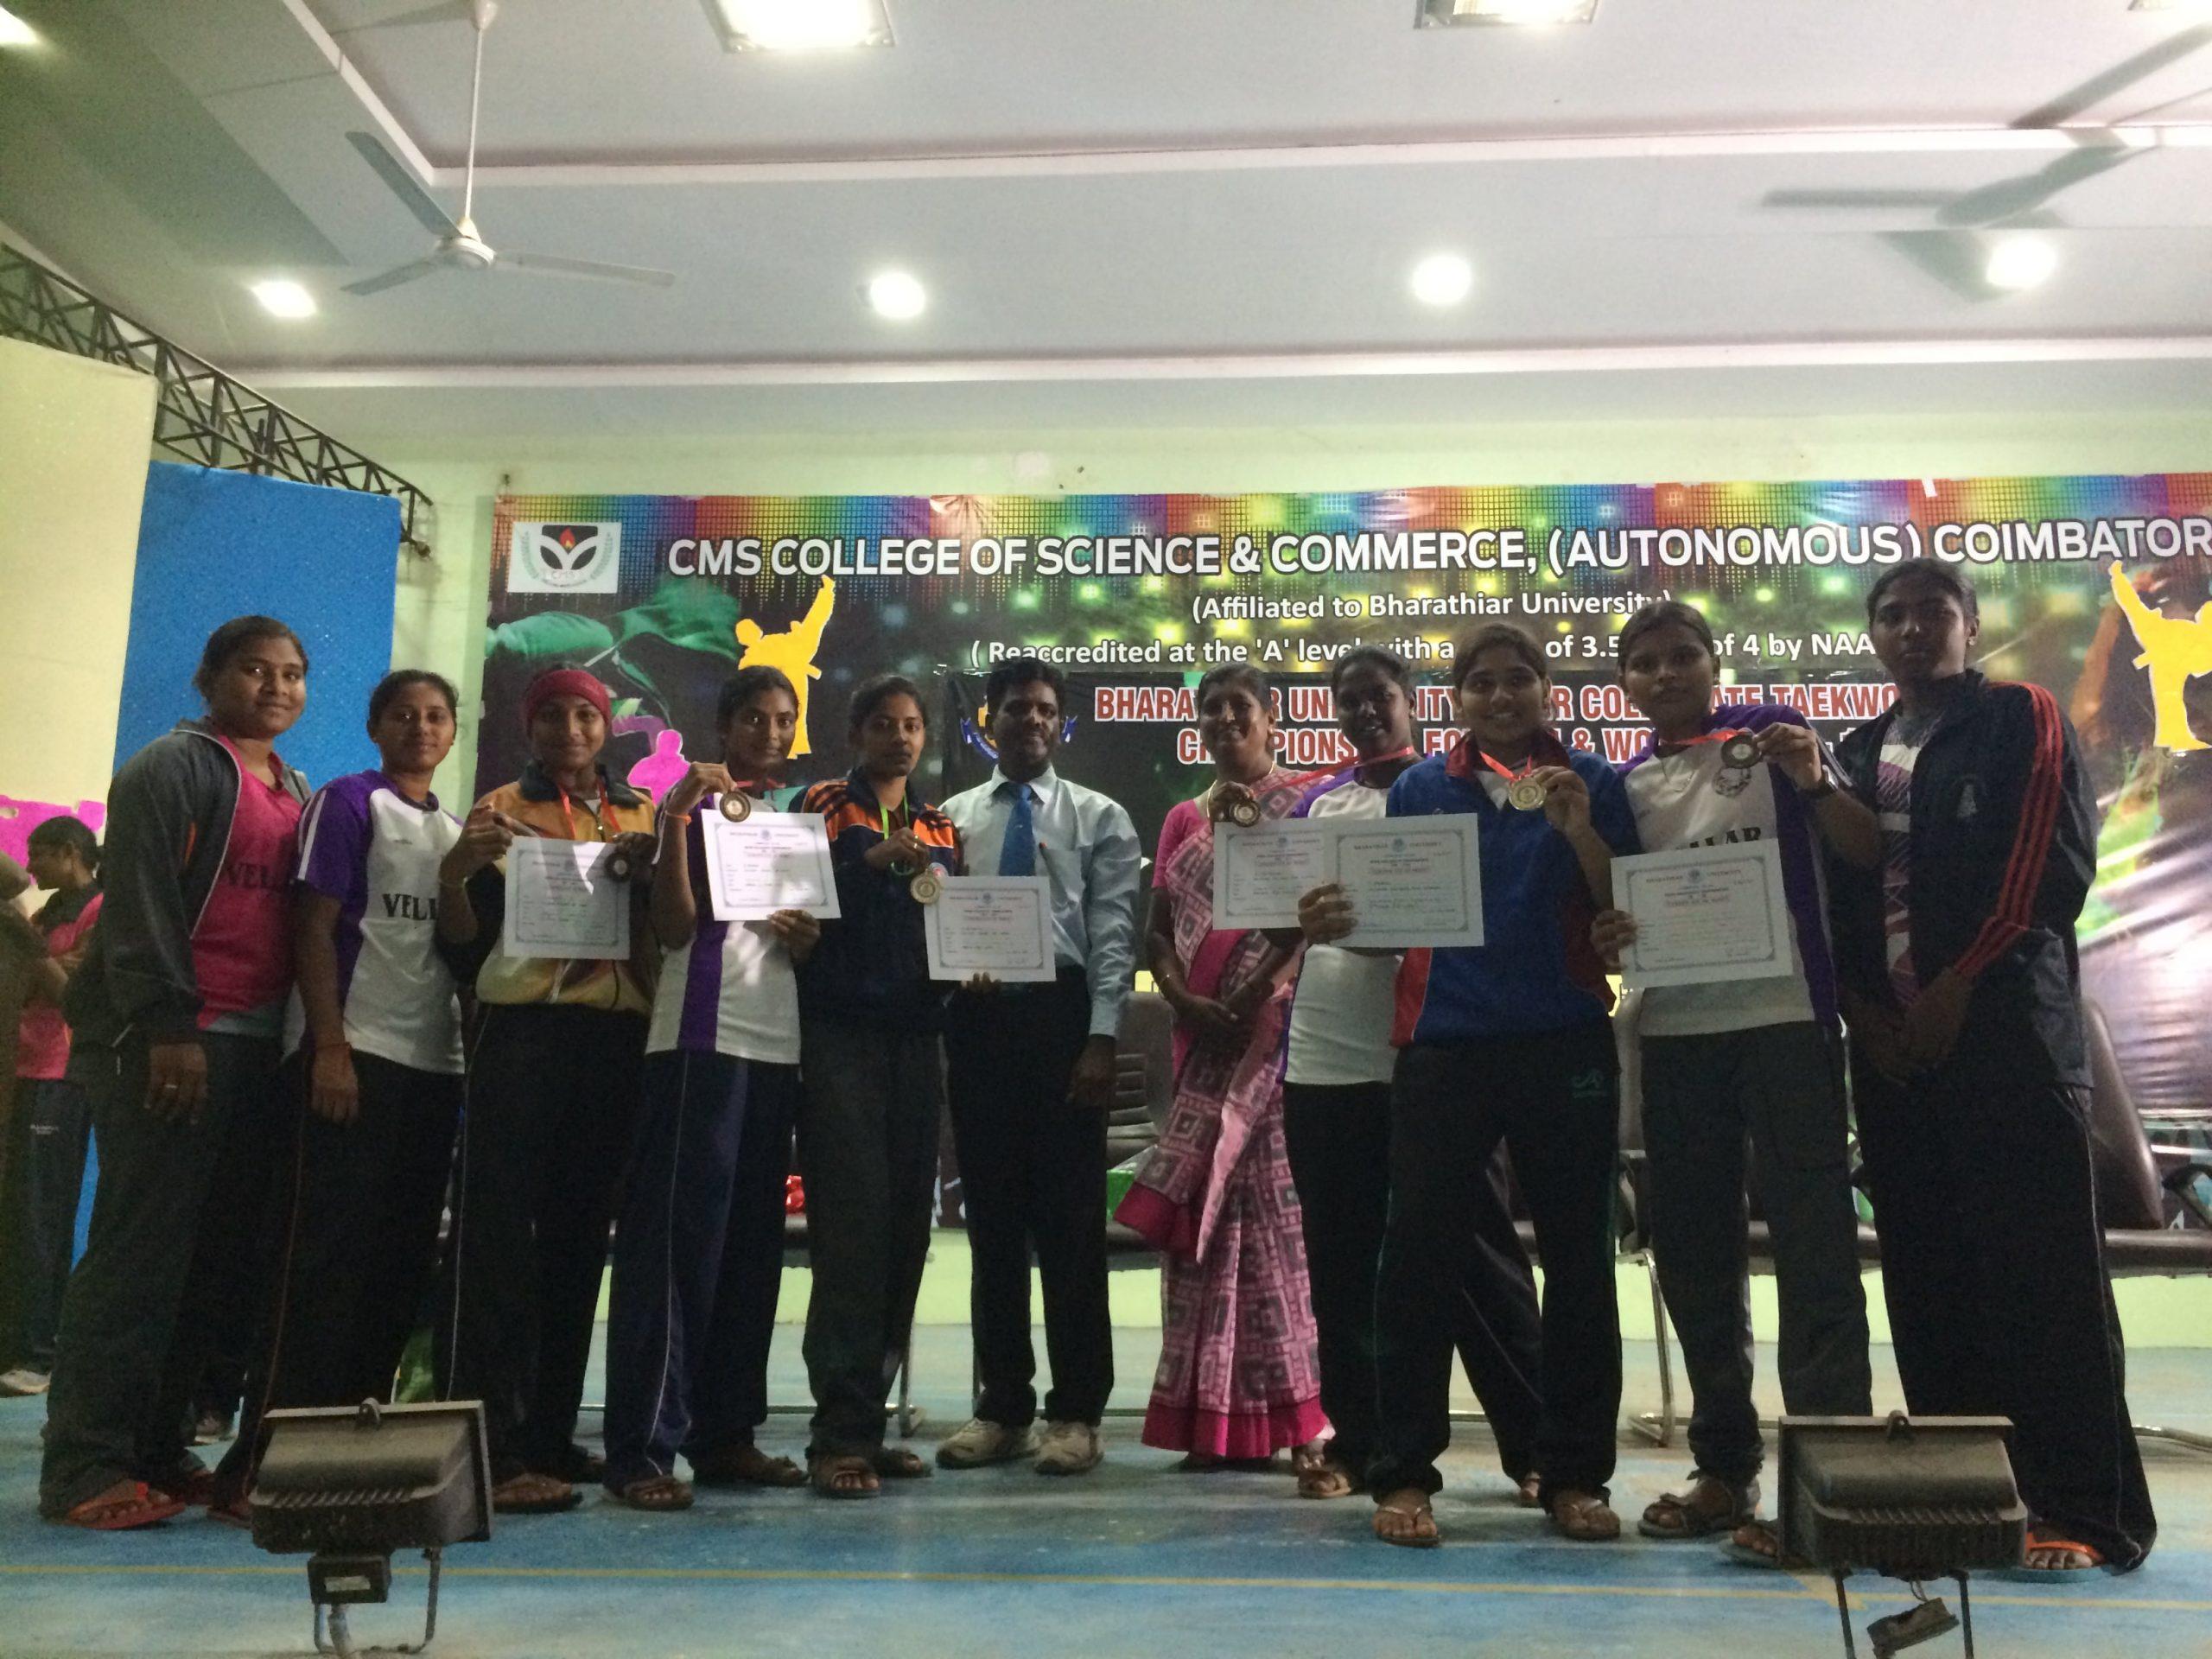 Extramural-Taekwondo